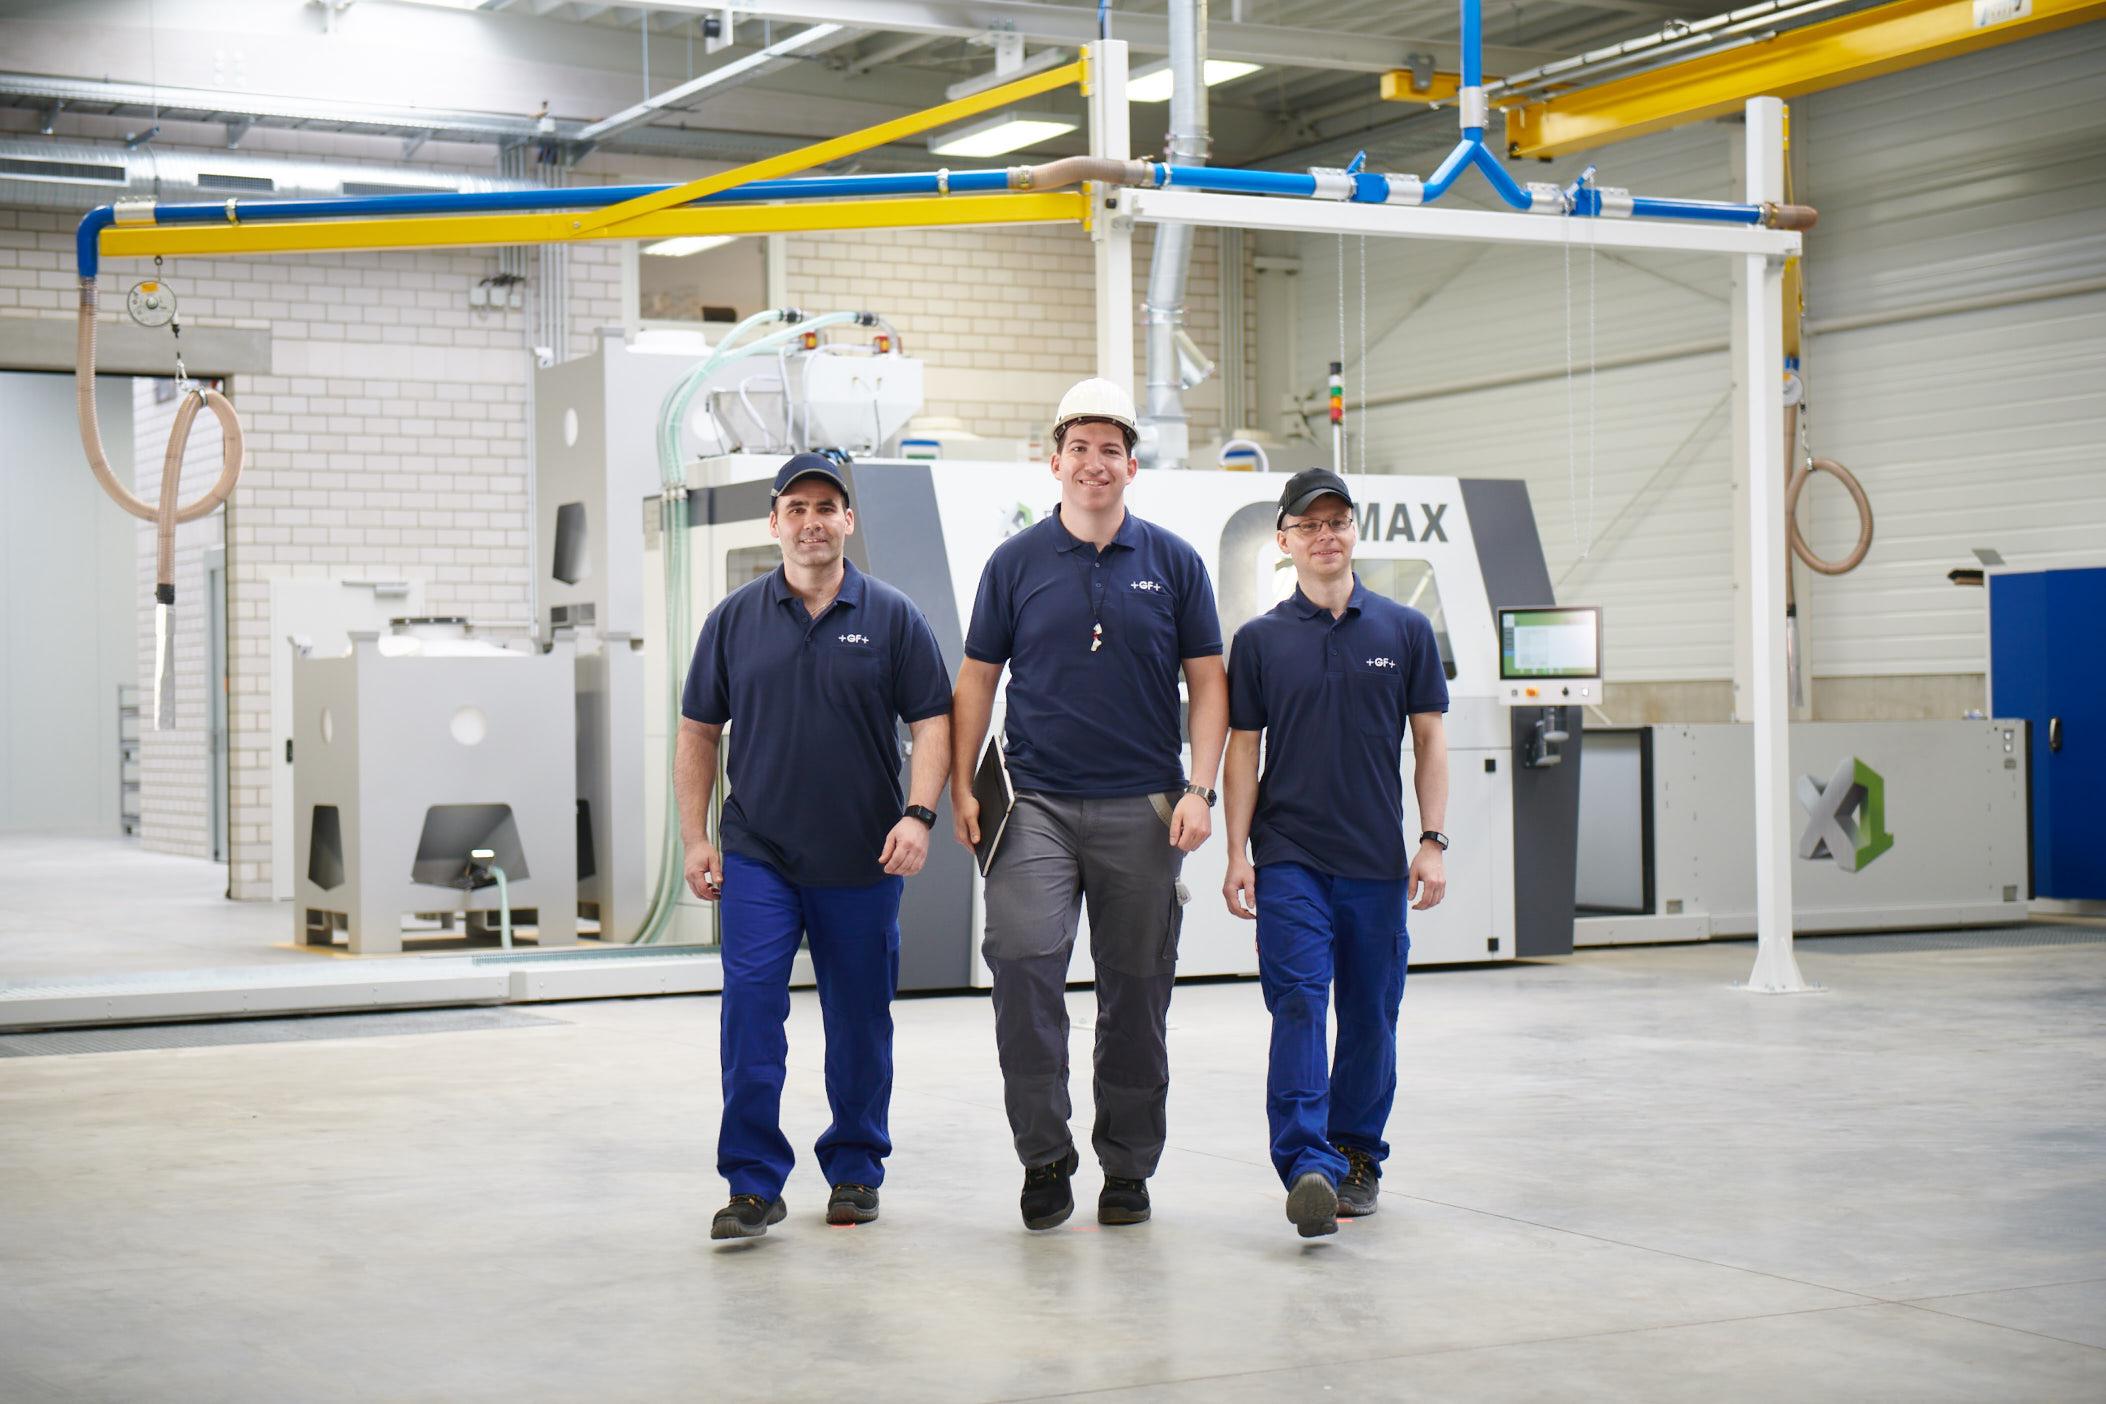 Fotos de GF Casting Solutions Leipzig GmbH